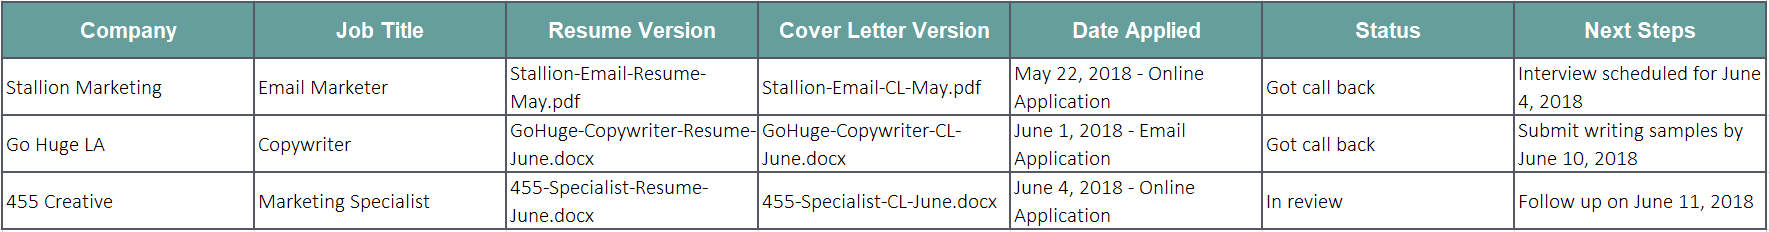 job-application-organization-spreadsheet-template